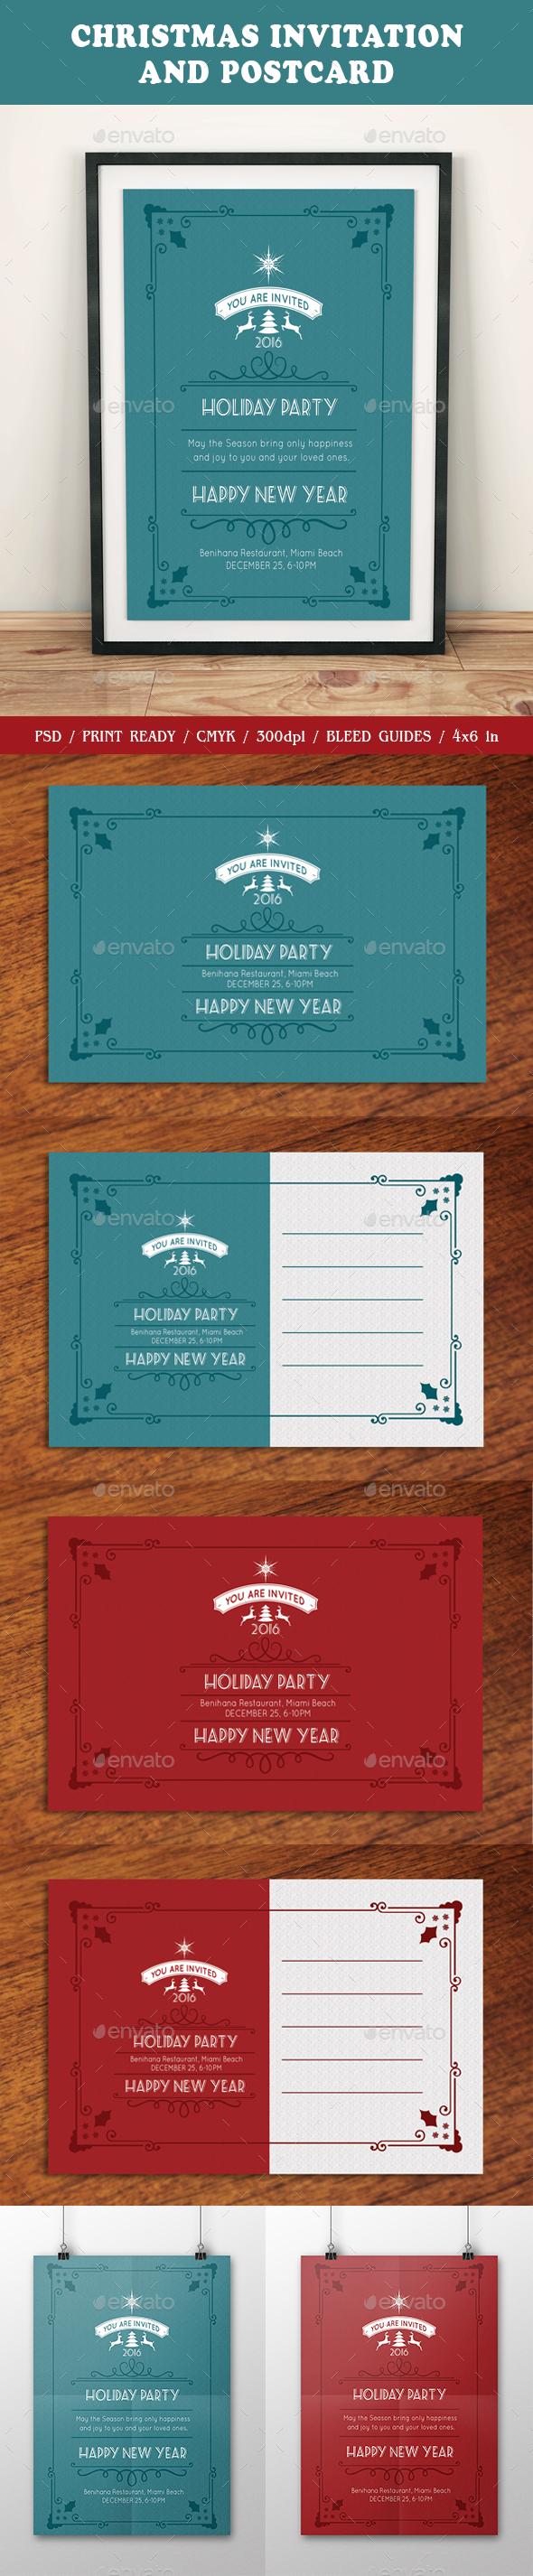 Christmas Invitation and Postcard - Invitations Cards & Invites